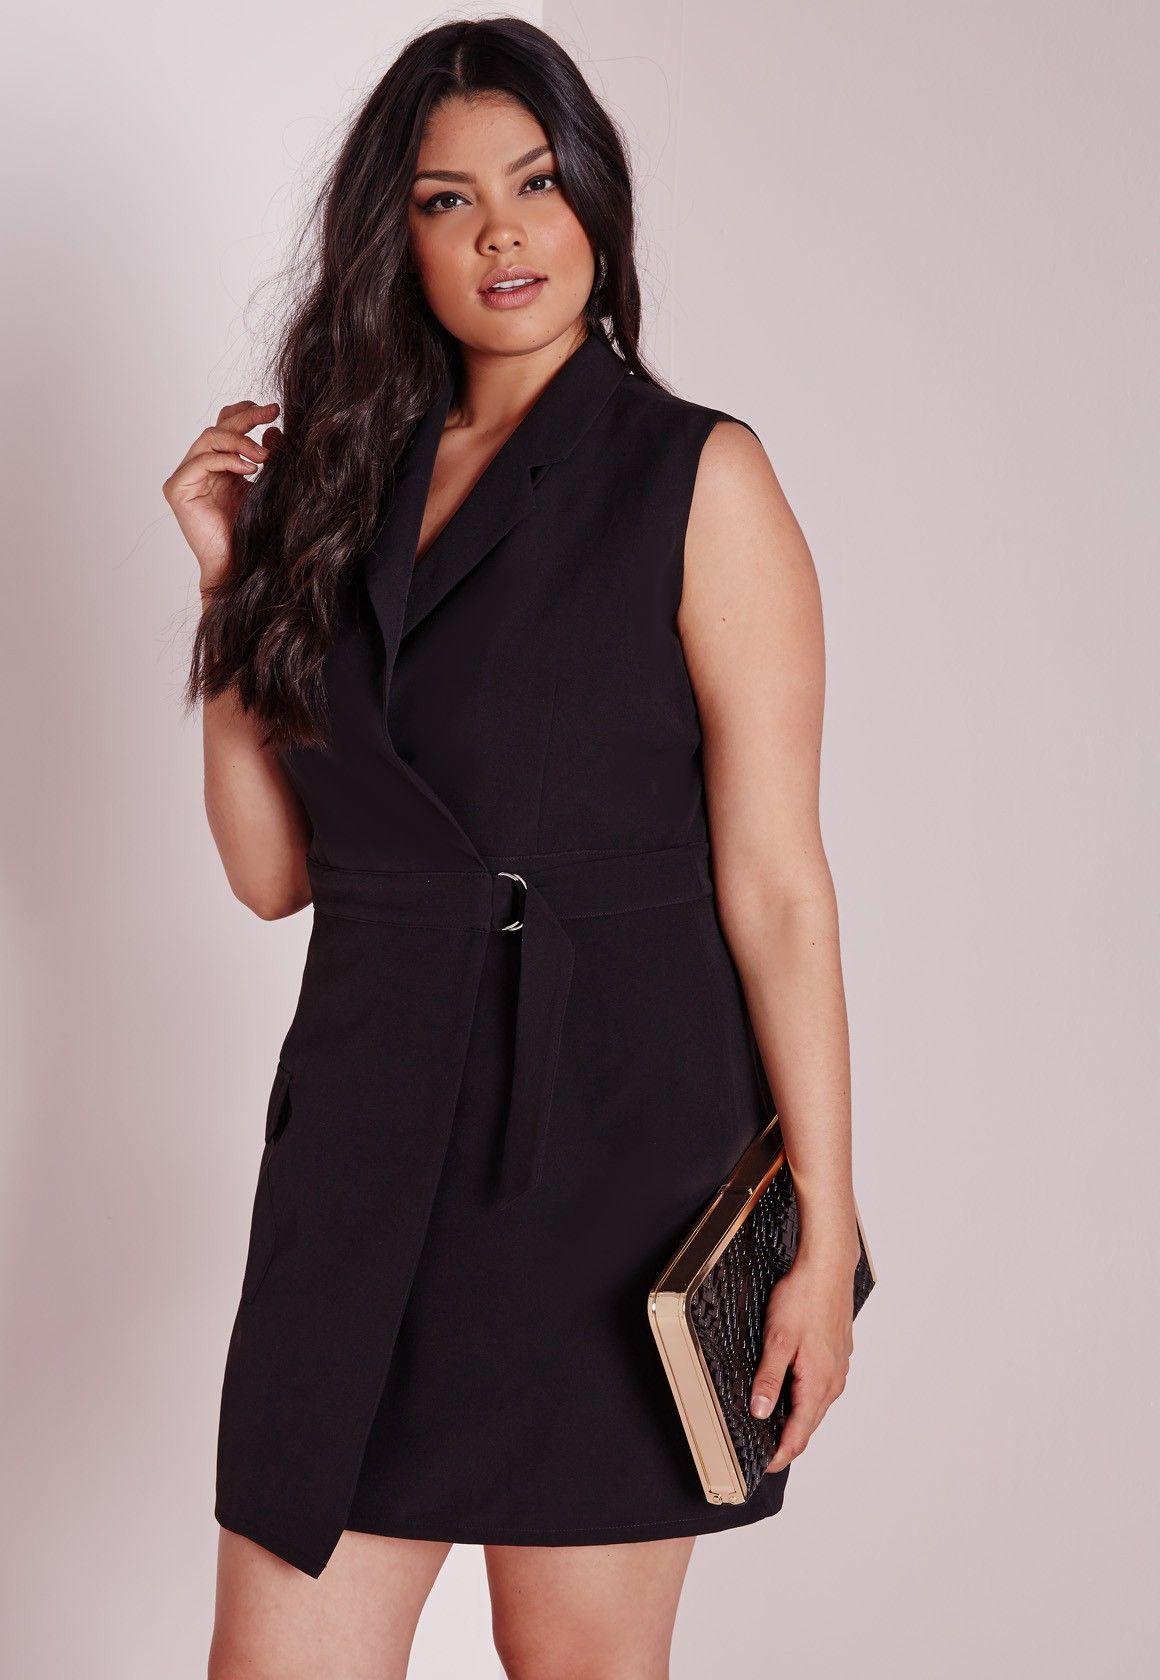 Missguided - Plus Size Wrap D-Ring Dress Black